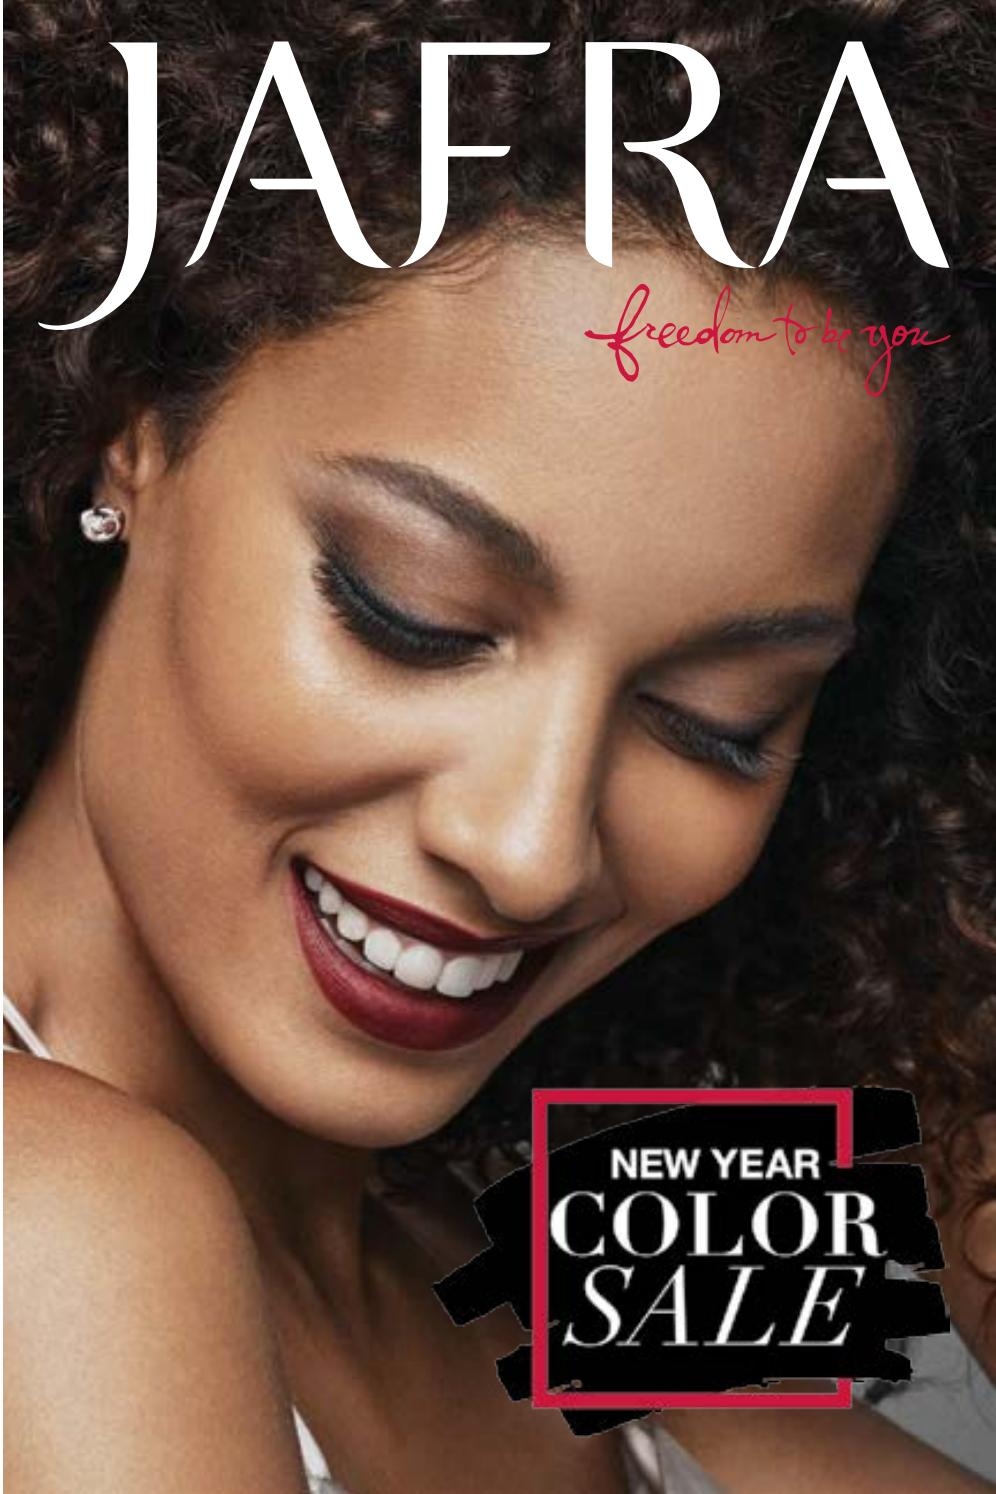 Jafra Brochure January 2018 By Stephanie B Sanchez Issuu Long Wear Creme Blush On